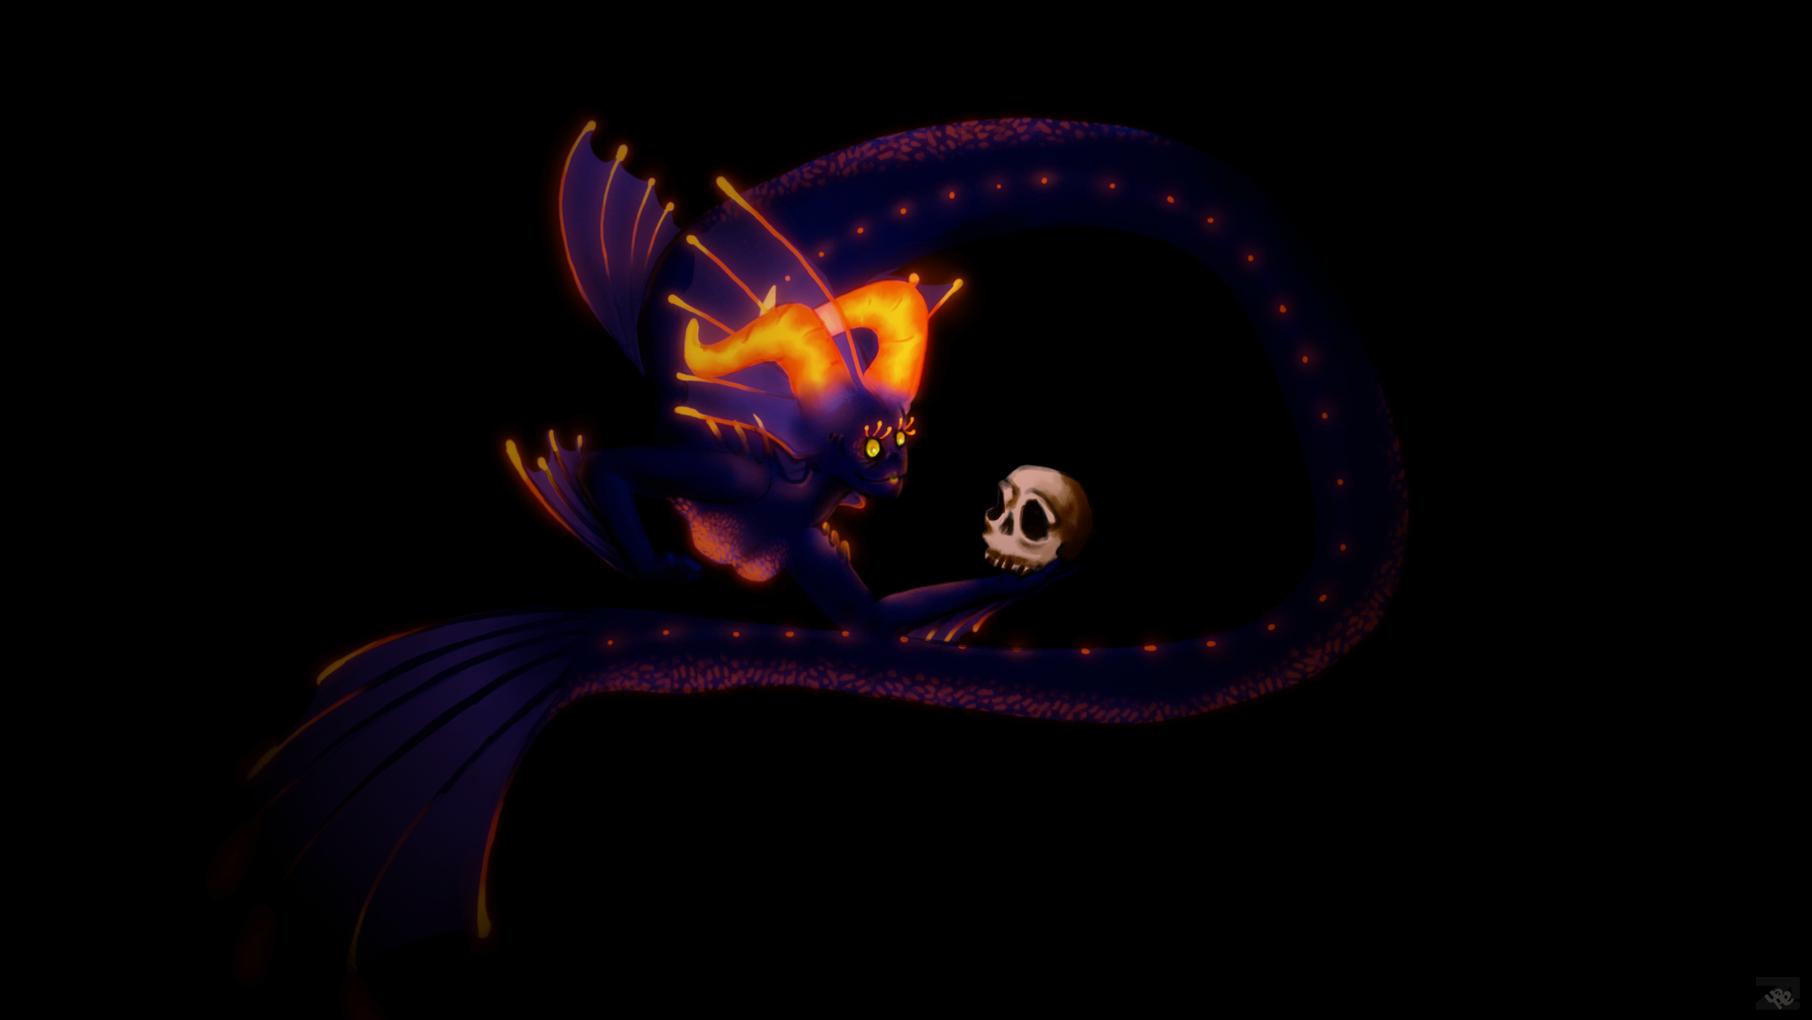 Deepsea Demon